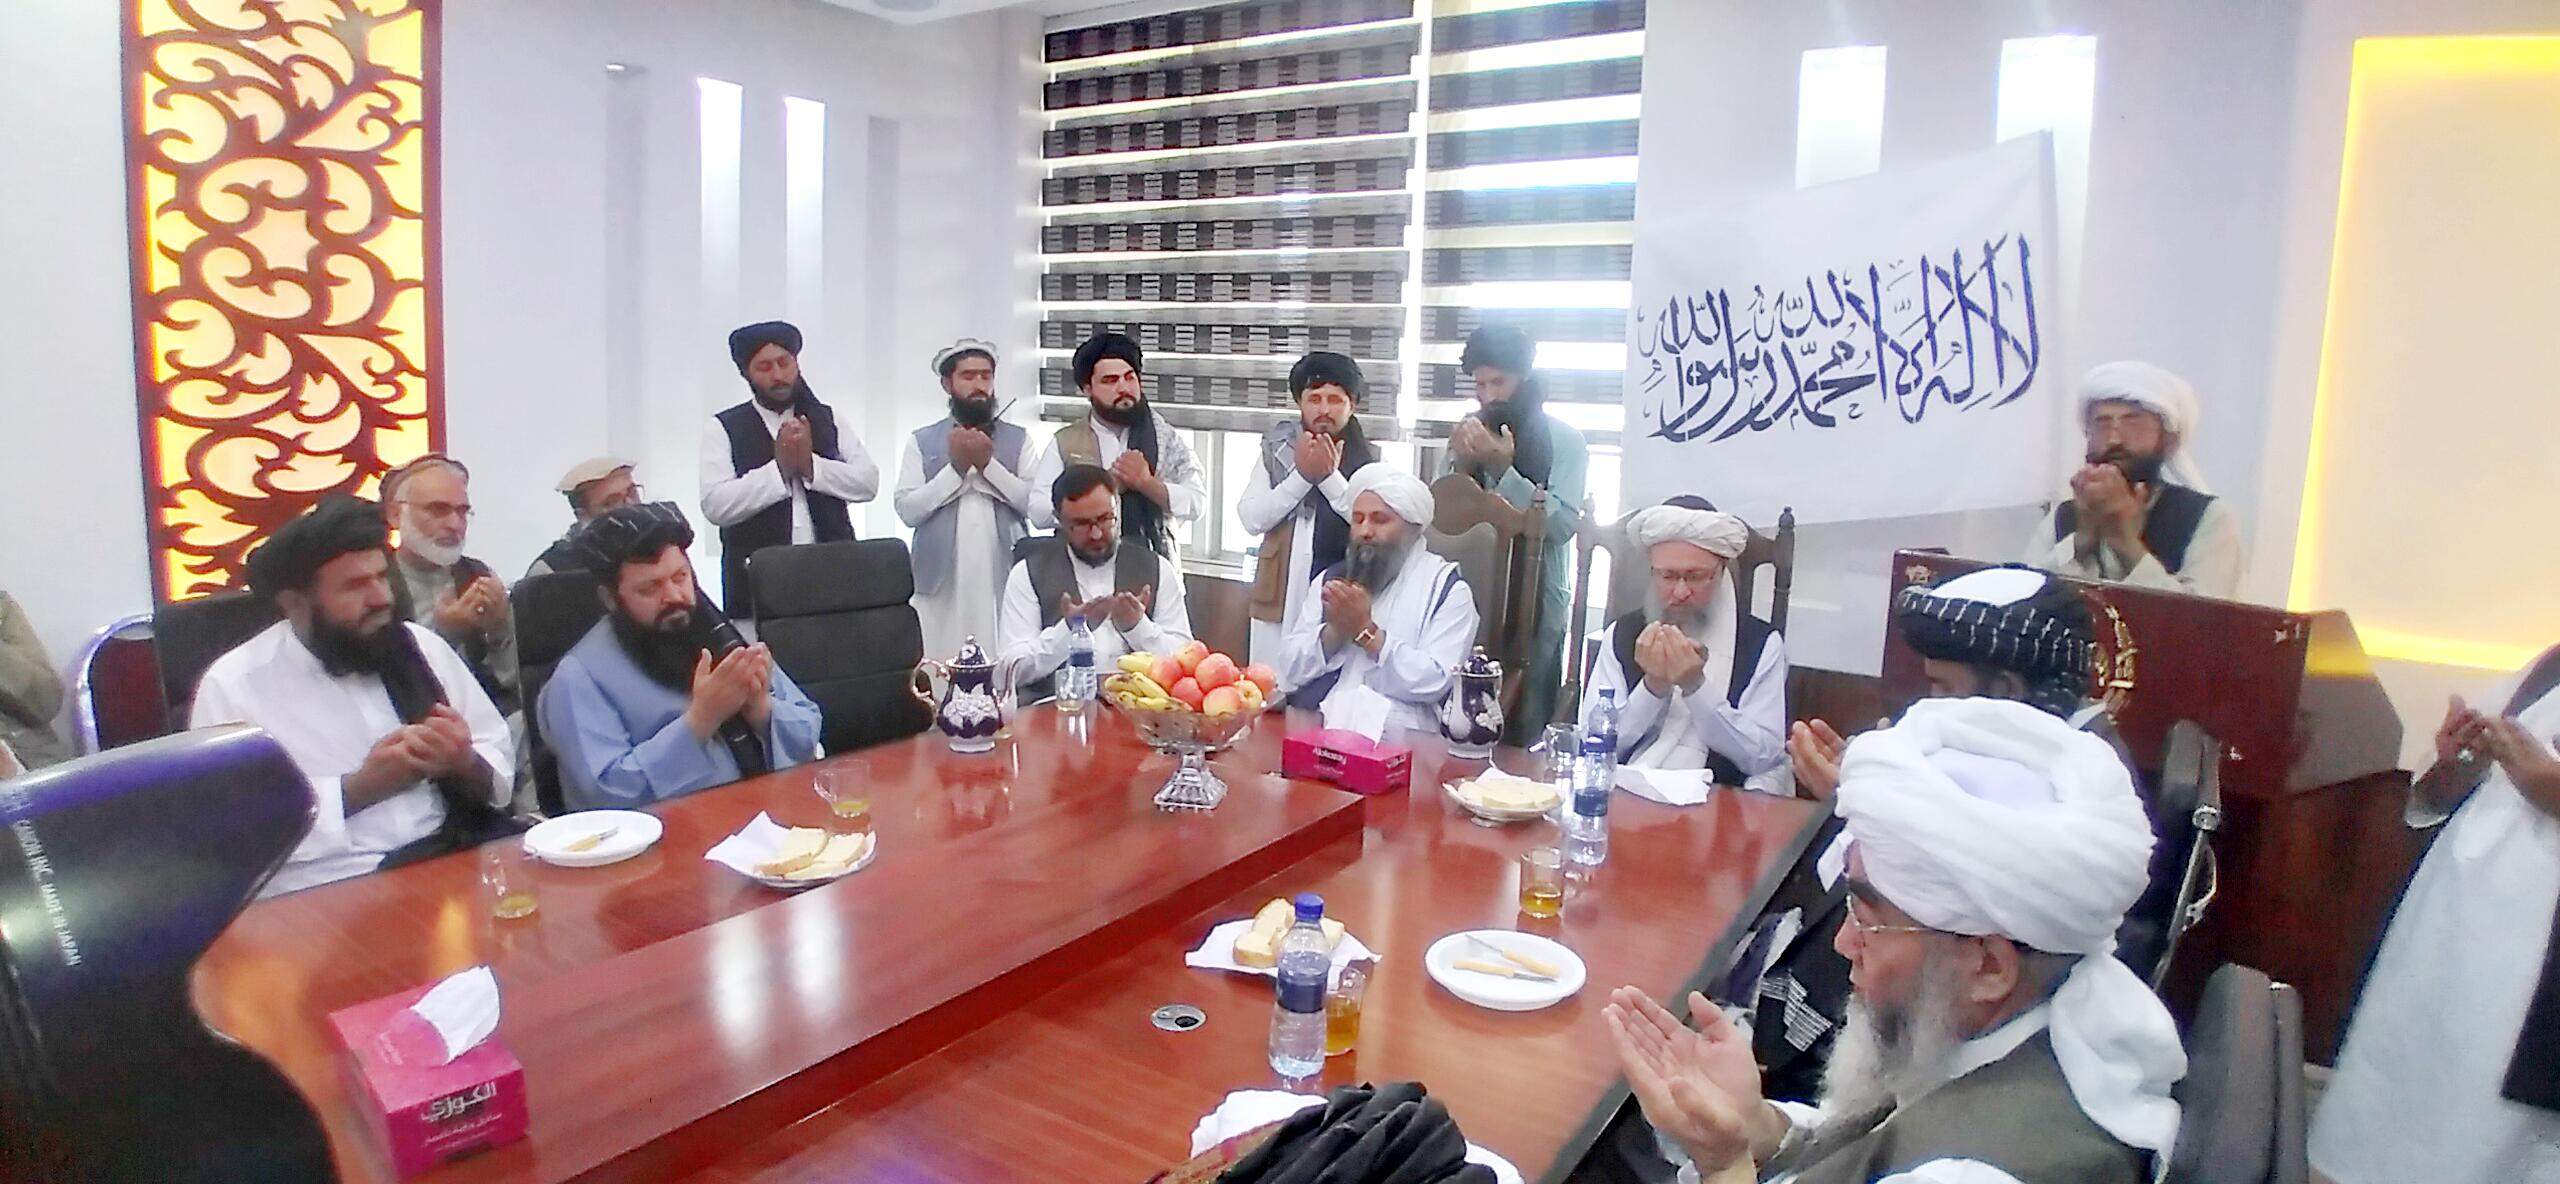 جلسه در اخیر با دعائیه محترم مولوی عبدالسلام سعادت پایان یافت.